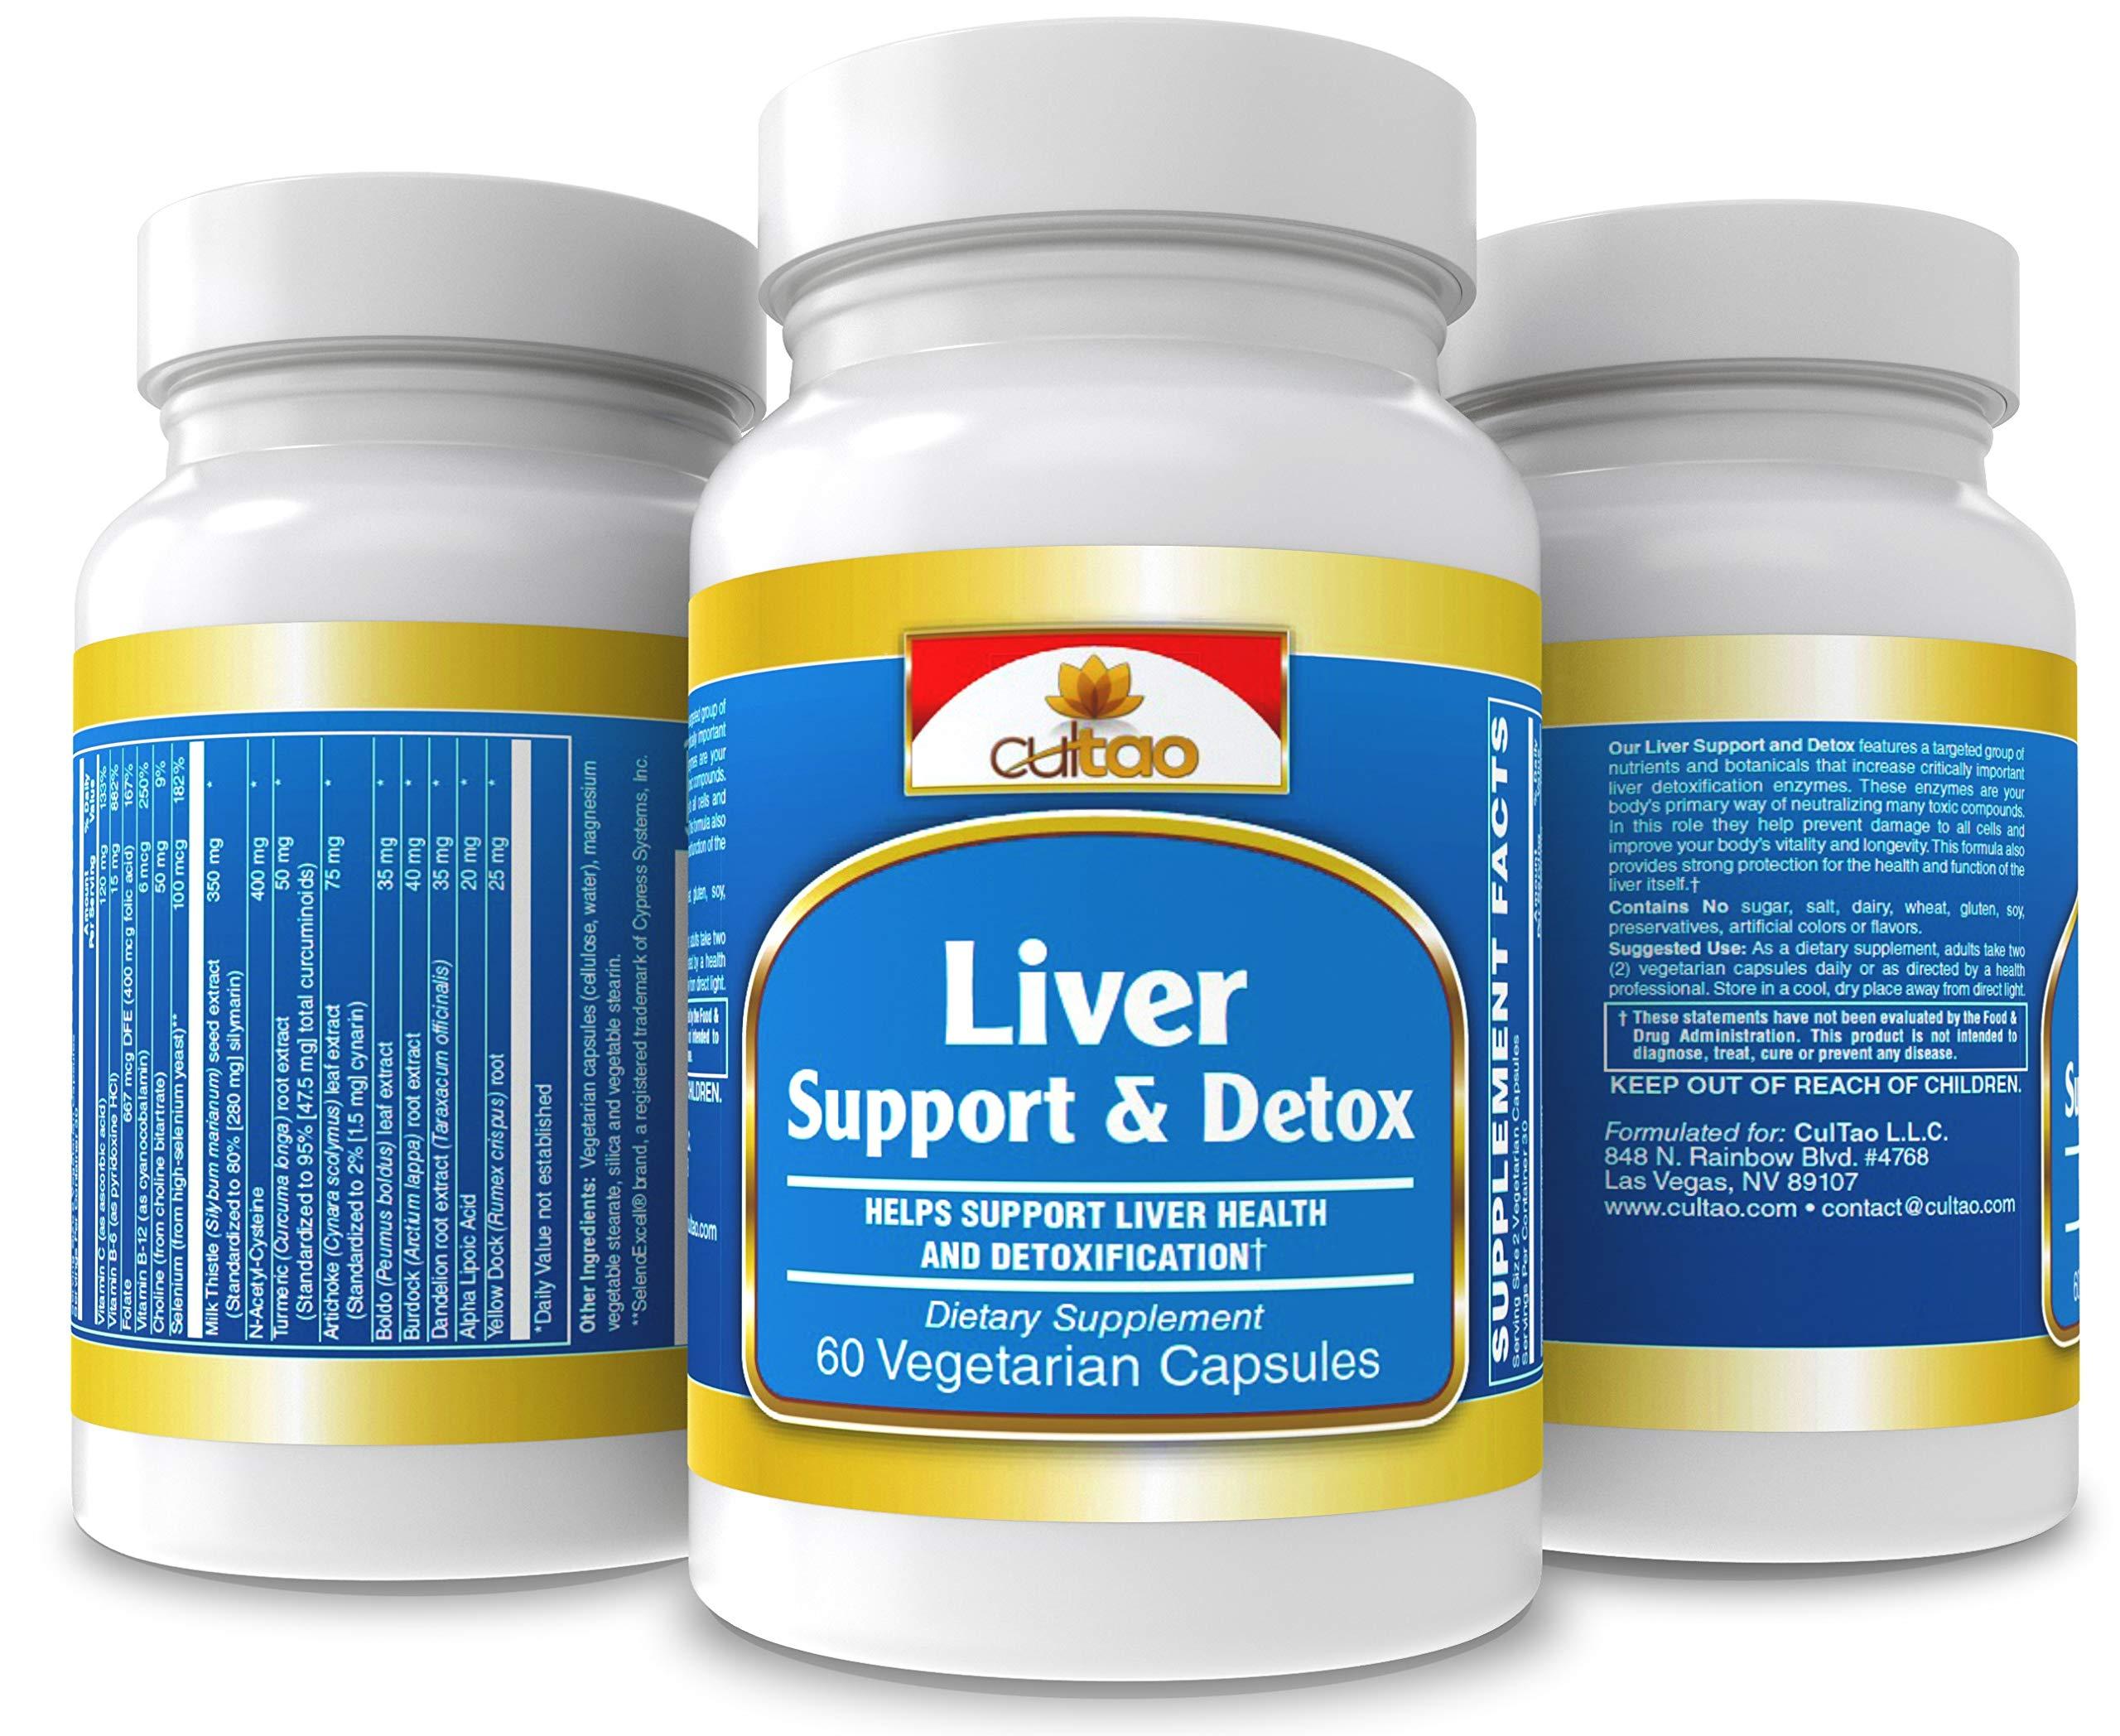 Liver Support & Detox - Natural Liver Cleanse > Boost Immune System > Burn Fat Easier - Premium Extract: Milk Thistle, Dandelion, Artichoke, Turmeric + Antioxidant: NAC, Organic Selenium - 60 Vcaps